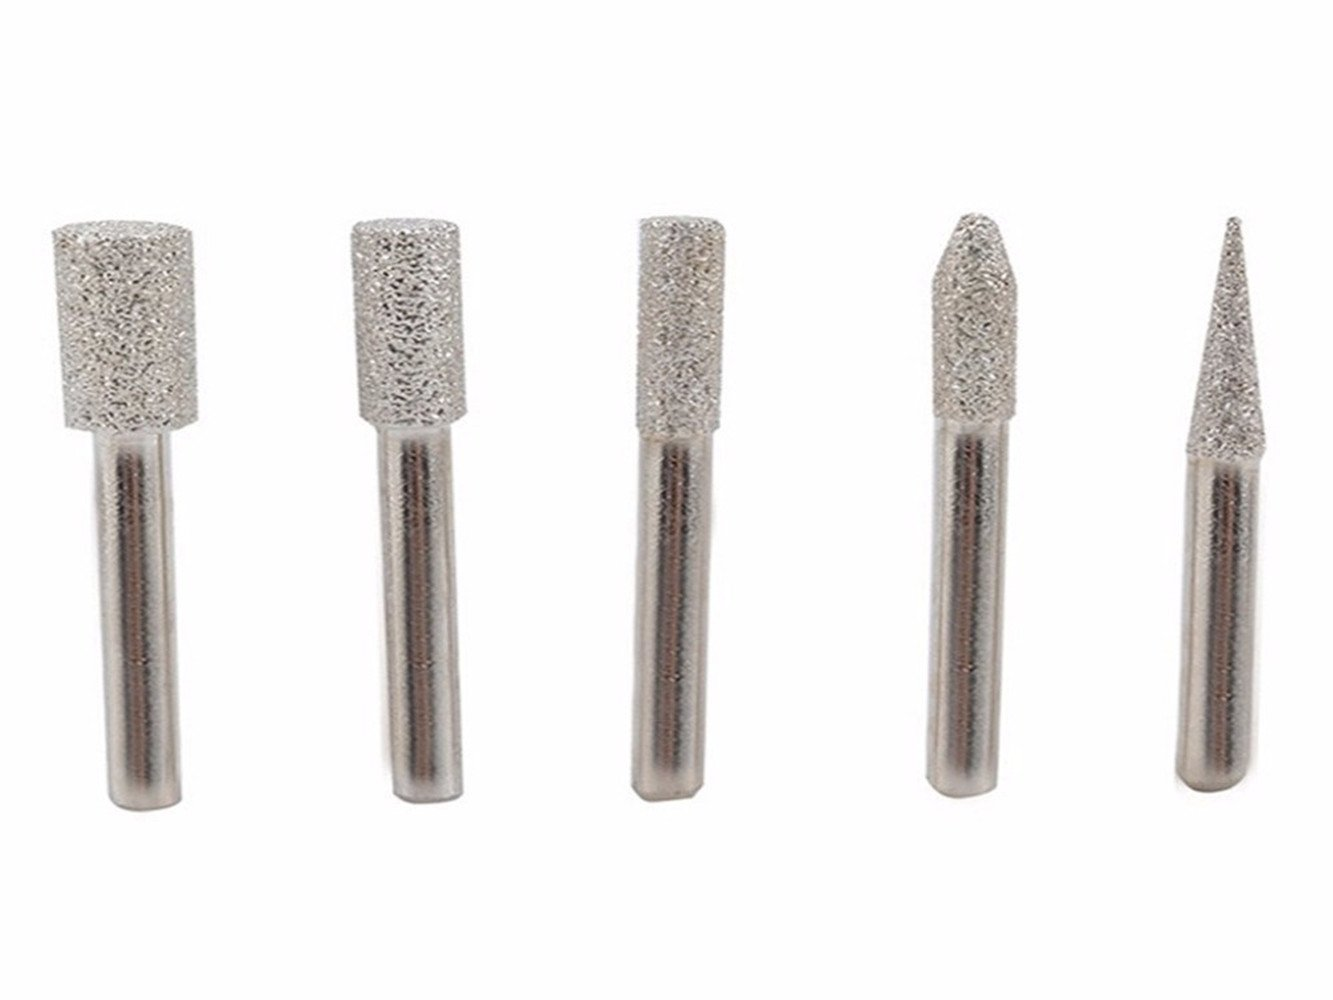 Brazed Grinding Bits KangTeer 5pcs 1/4'' Shank Brazed Diamond Burrs for Stone Concrete Ceramic Diamond Mill Diamond Polishing Buffing Mounted Point